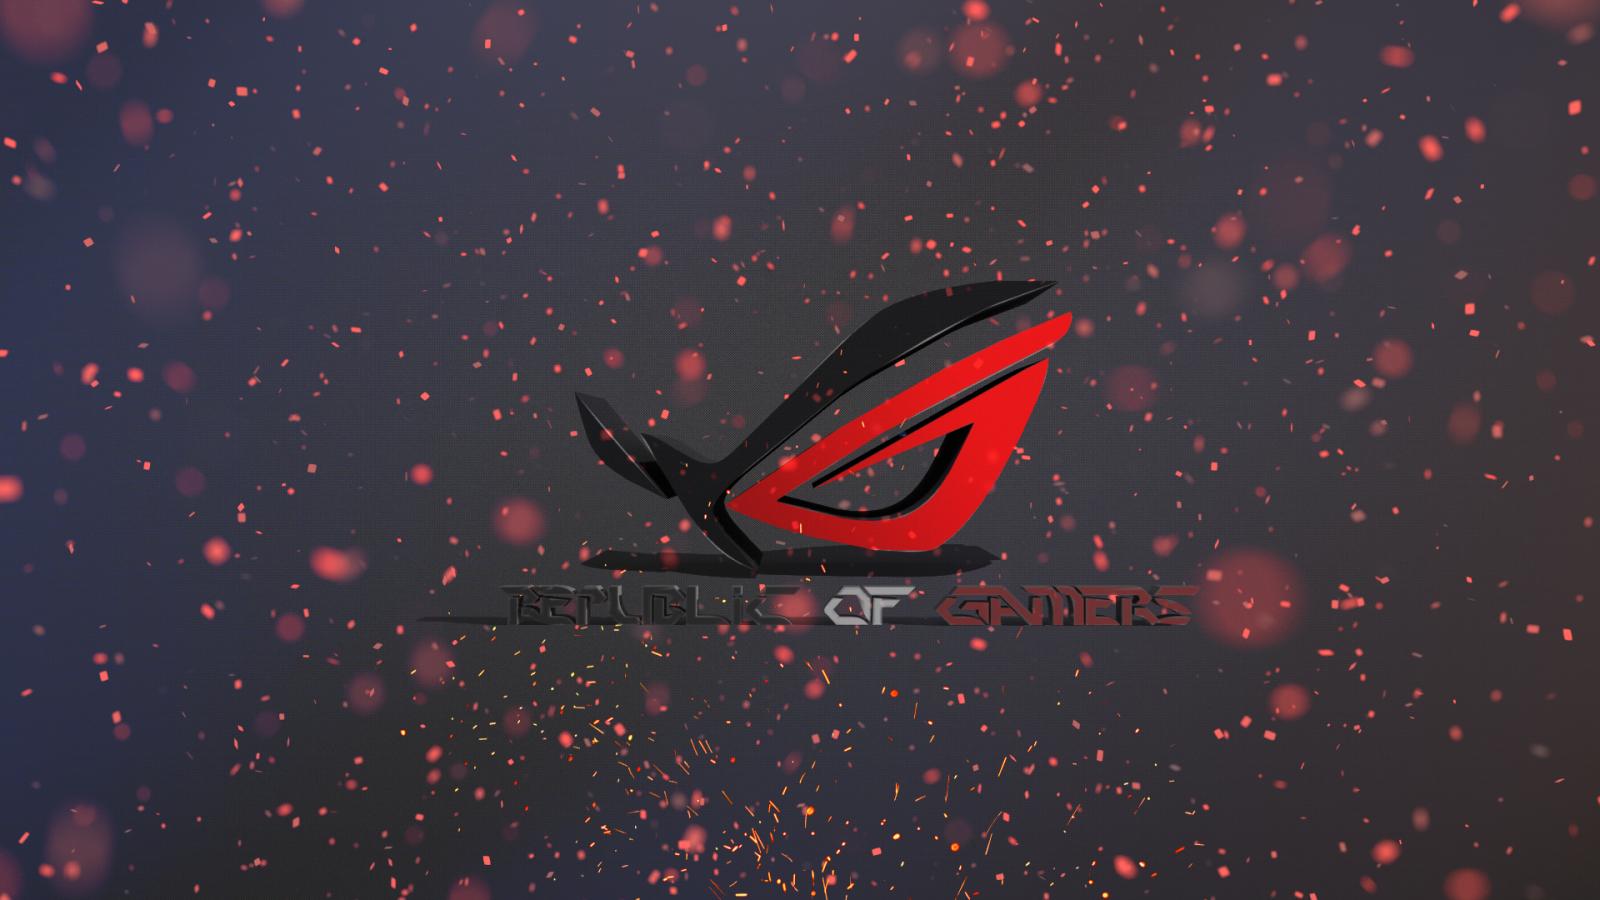 Illustration Heart Red Republic Of Gamers ASUS Darkness Screenshot Computer Wallpaper Font